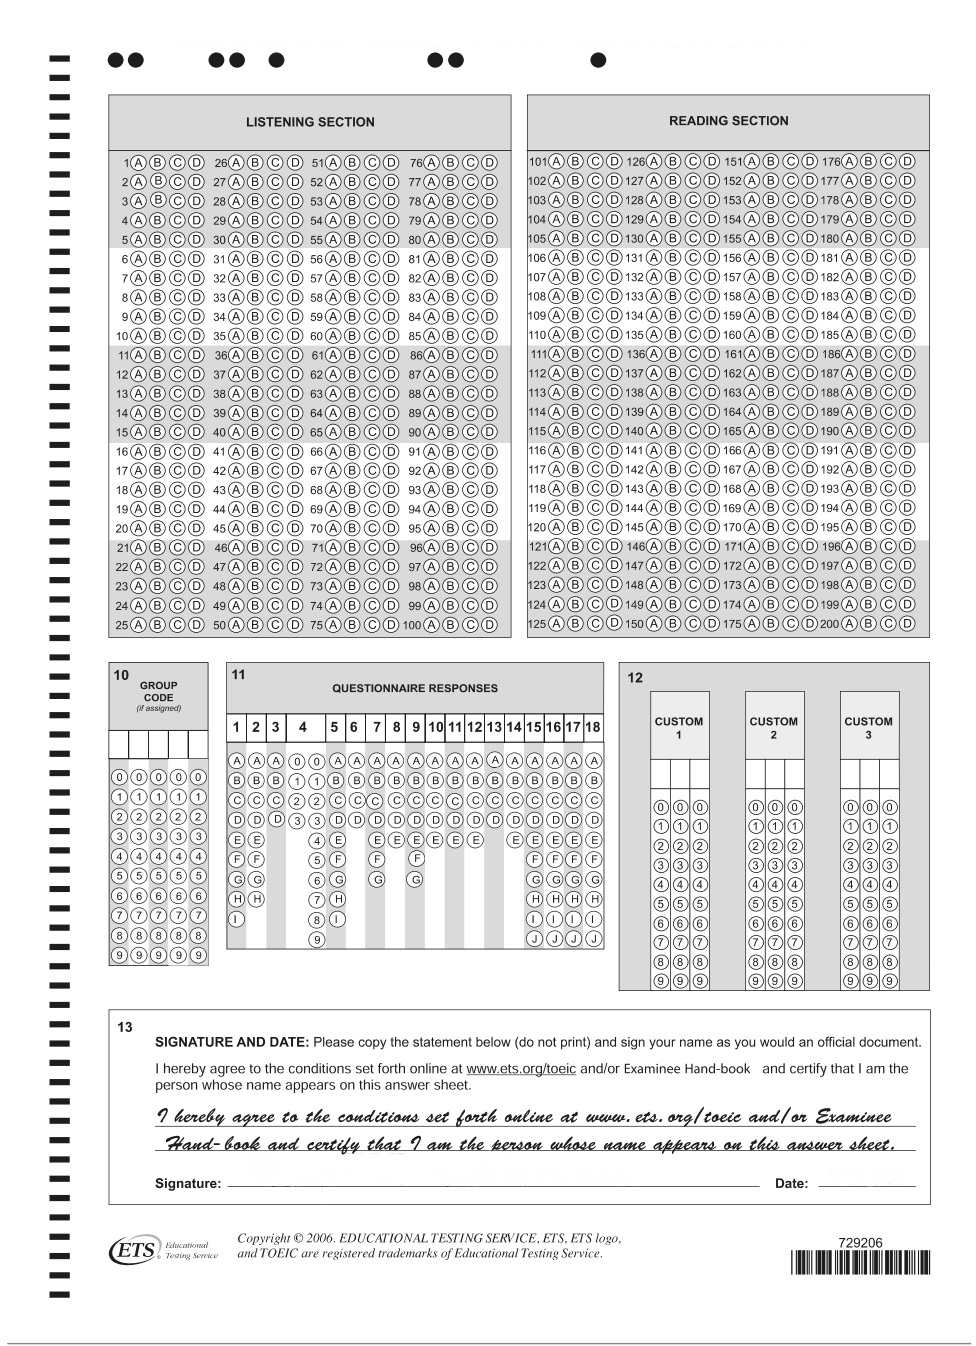 answer-sheet-toeic